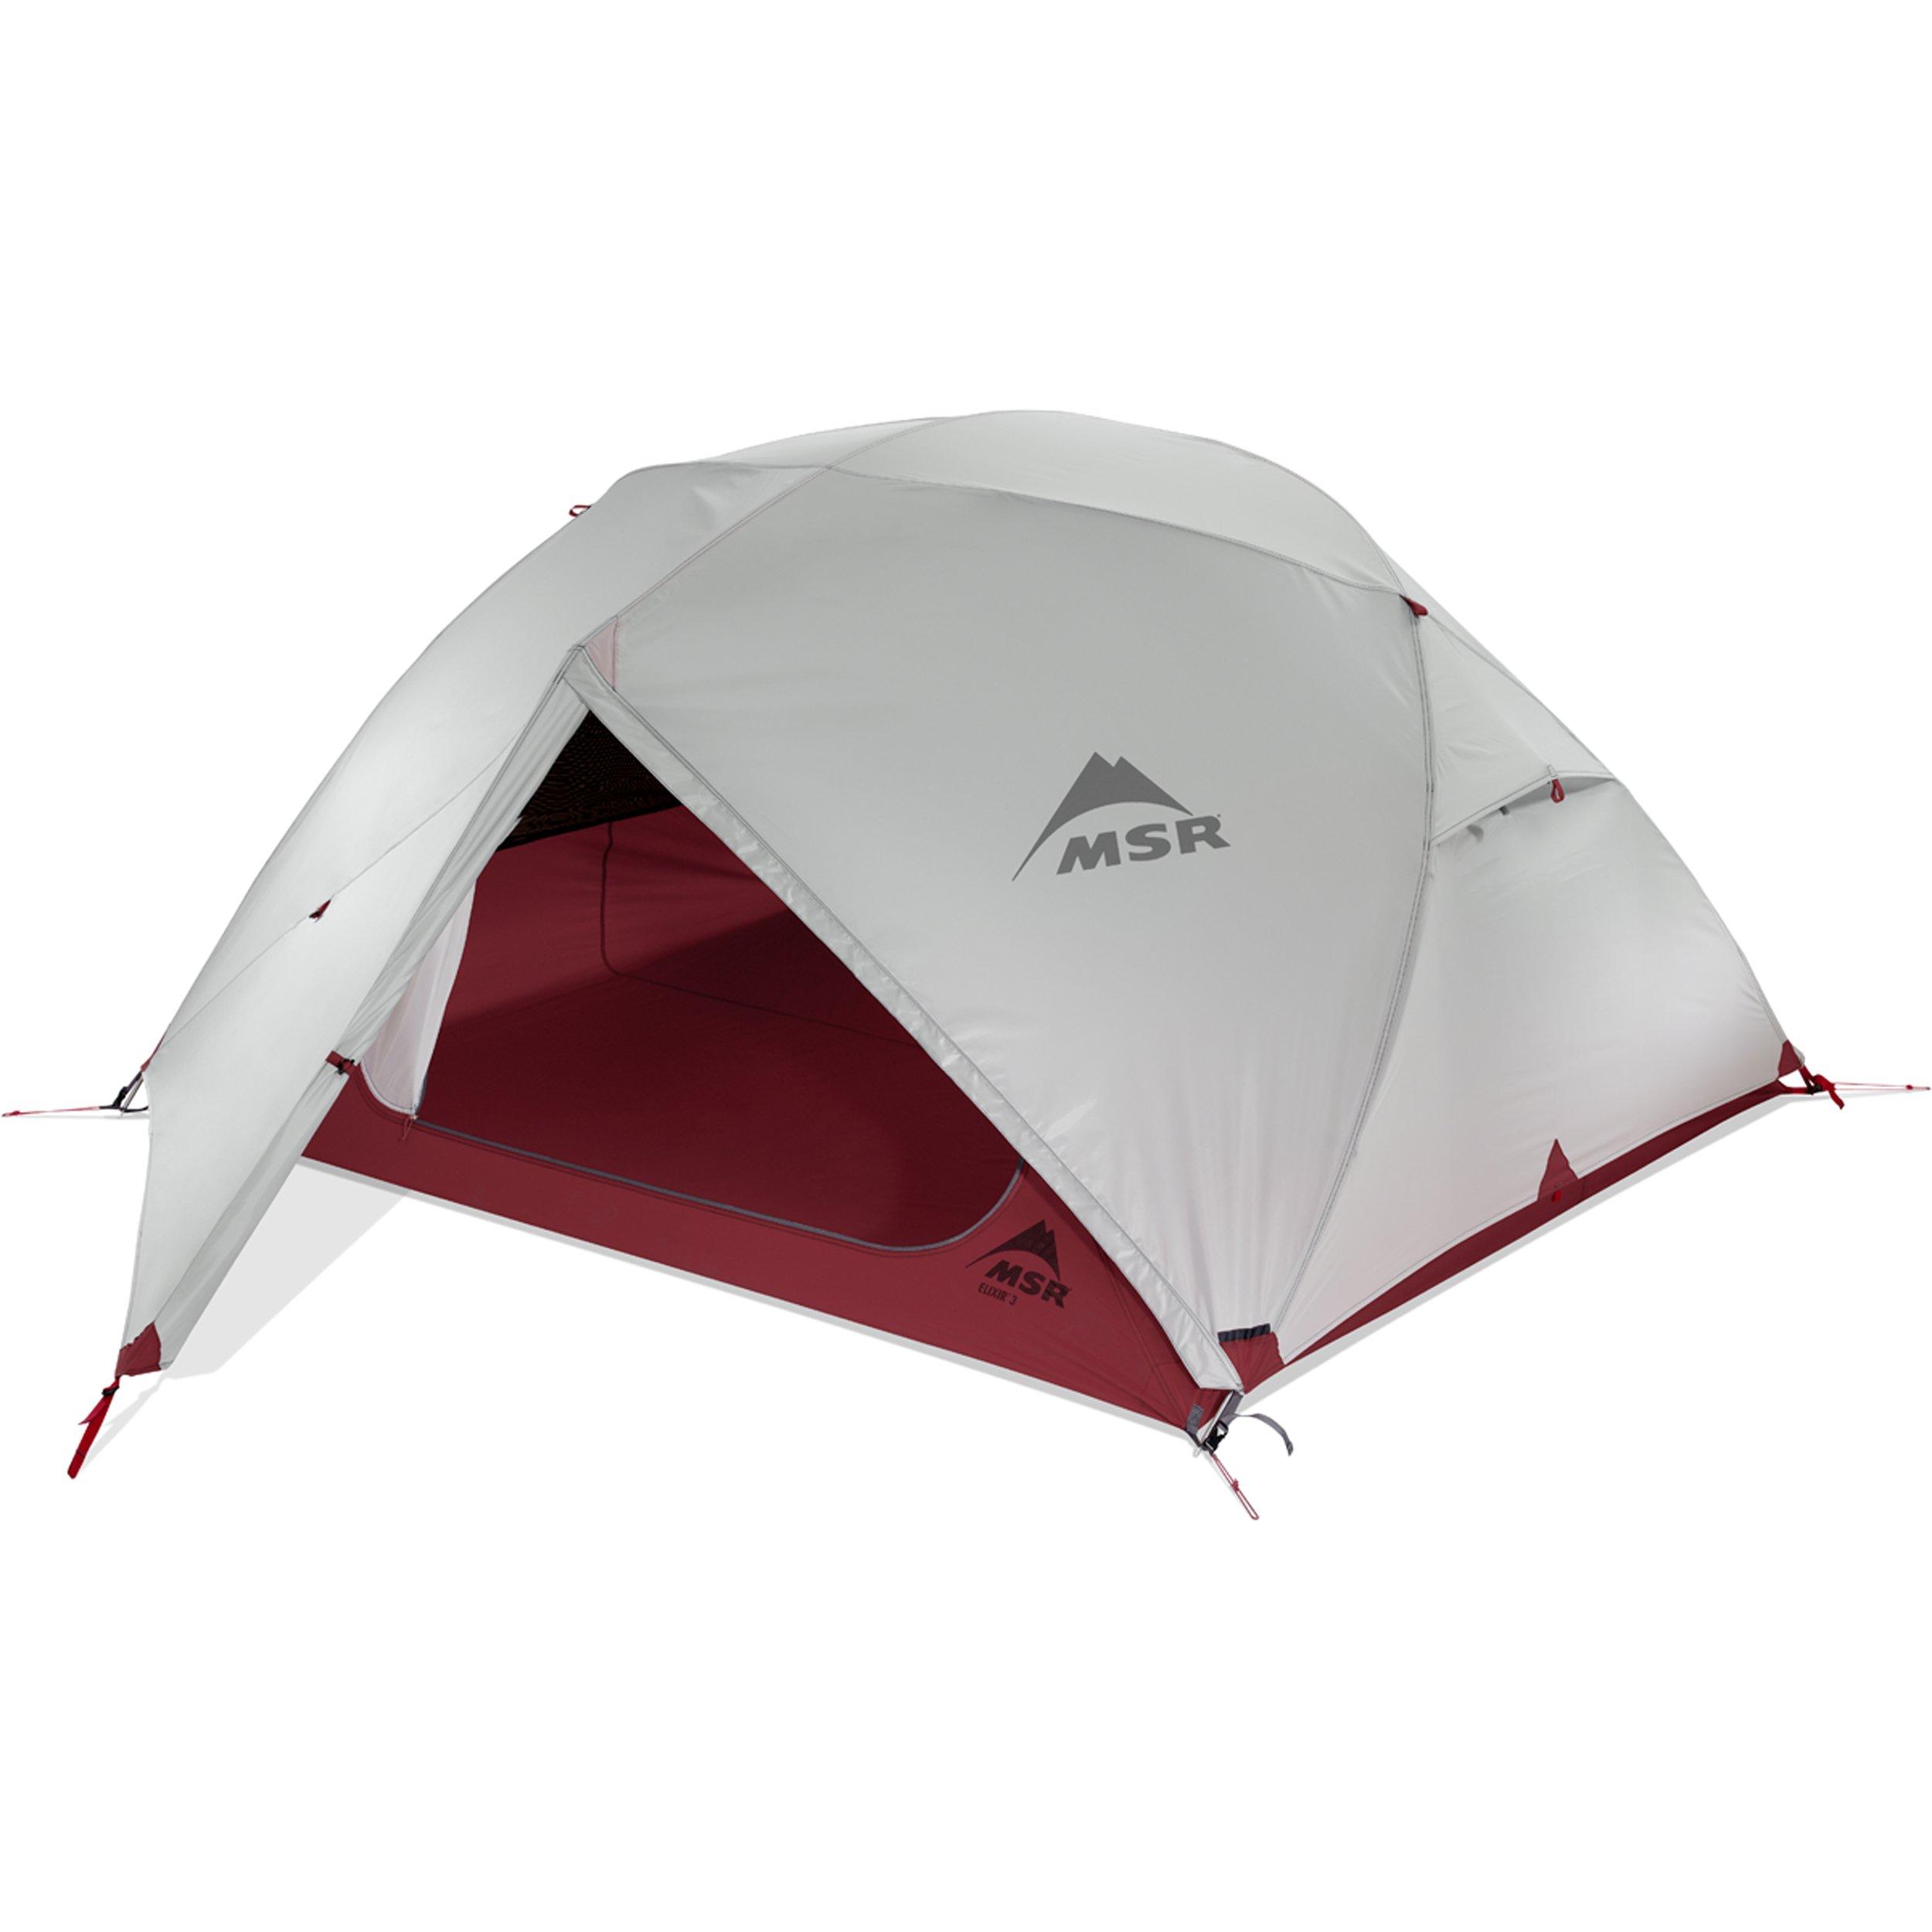 MSR Elixir 3 Backpacking Tent, Red by MSR (Image #3)